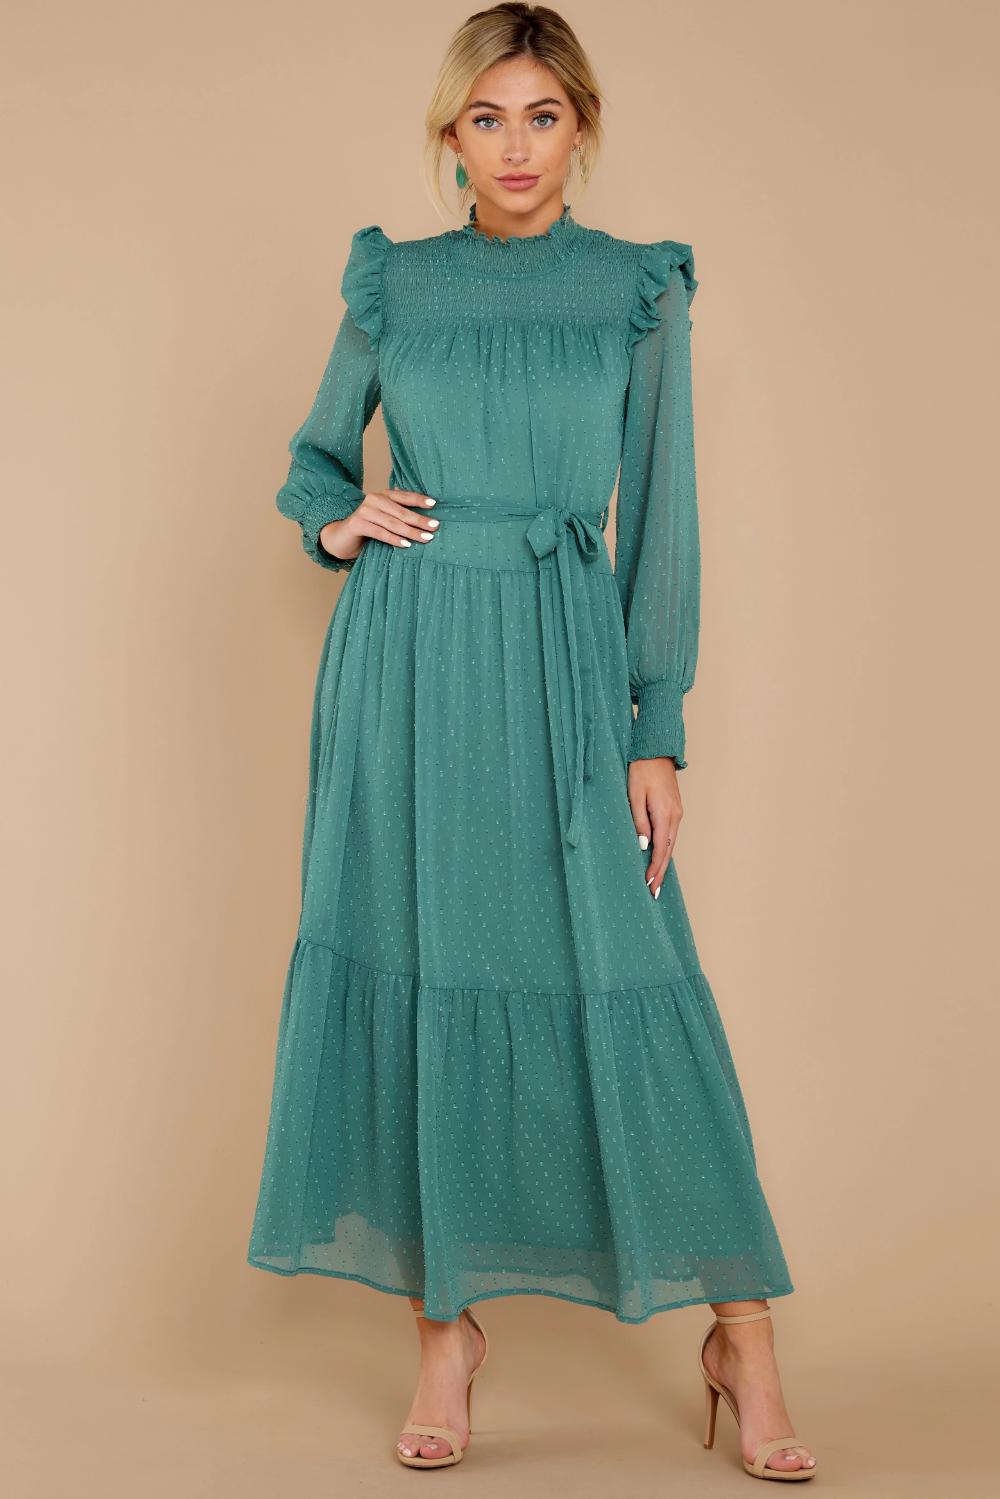 Quite Charming Sea Green Midi Dress Green Midi Dress Long Sleeve Dress Fancy Midi Dresses [ 1499 x 1000 Pixel ]